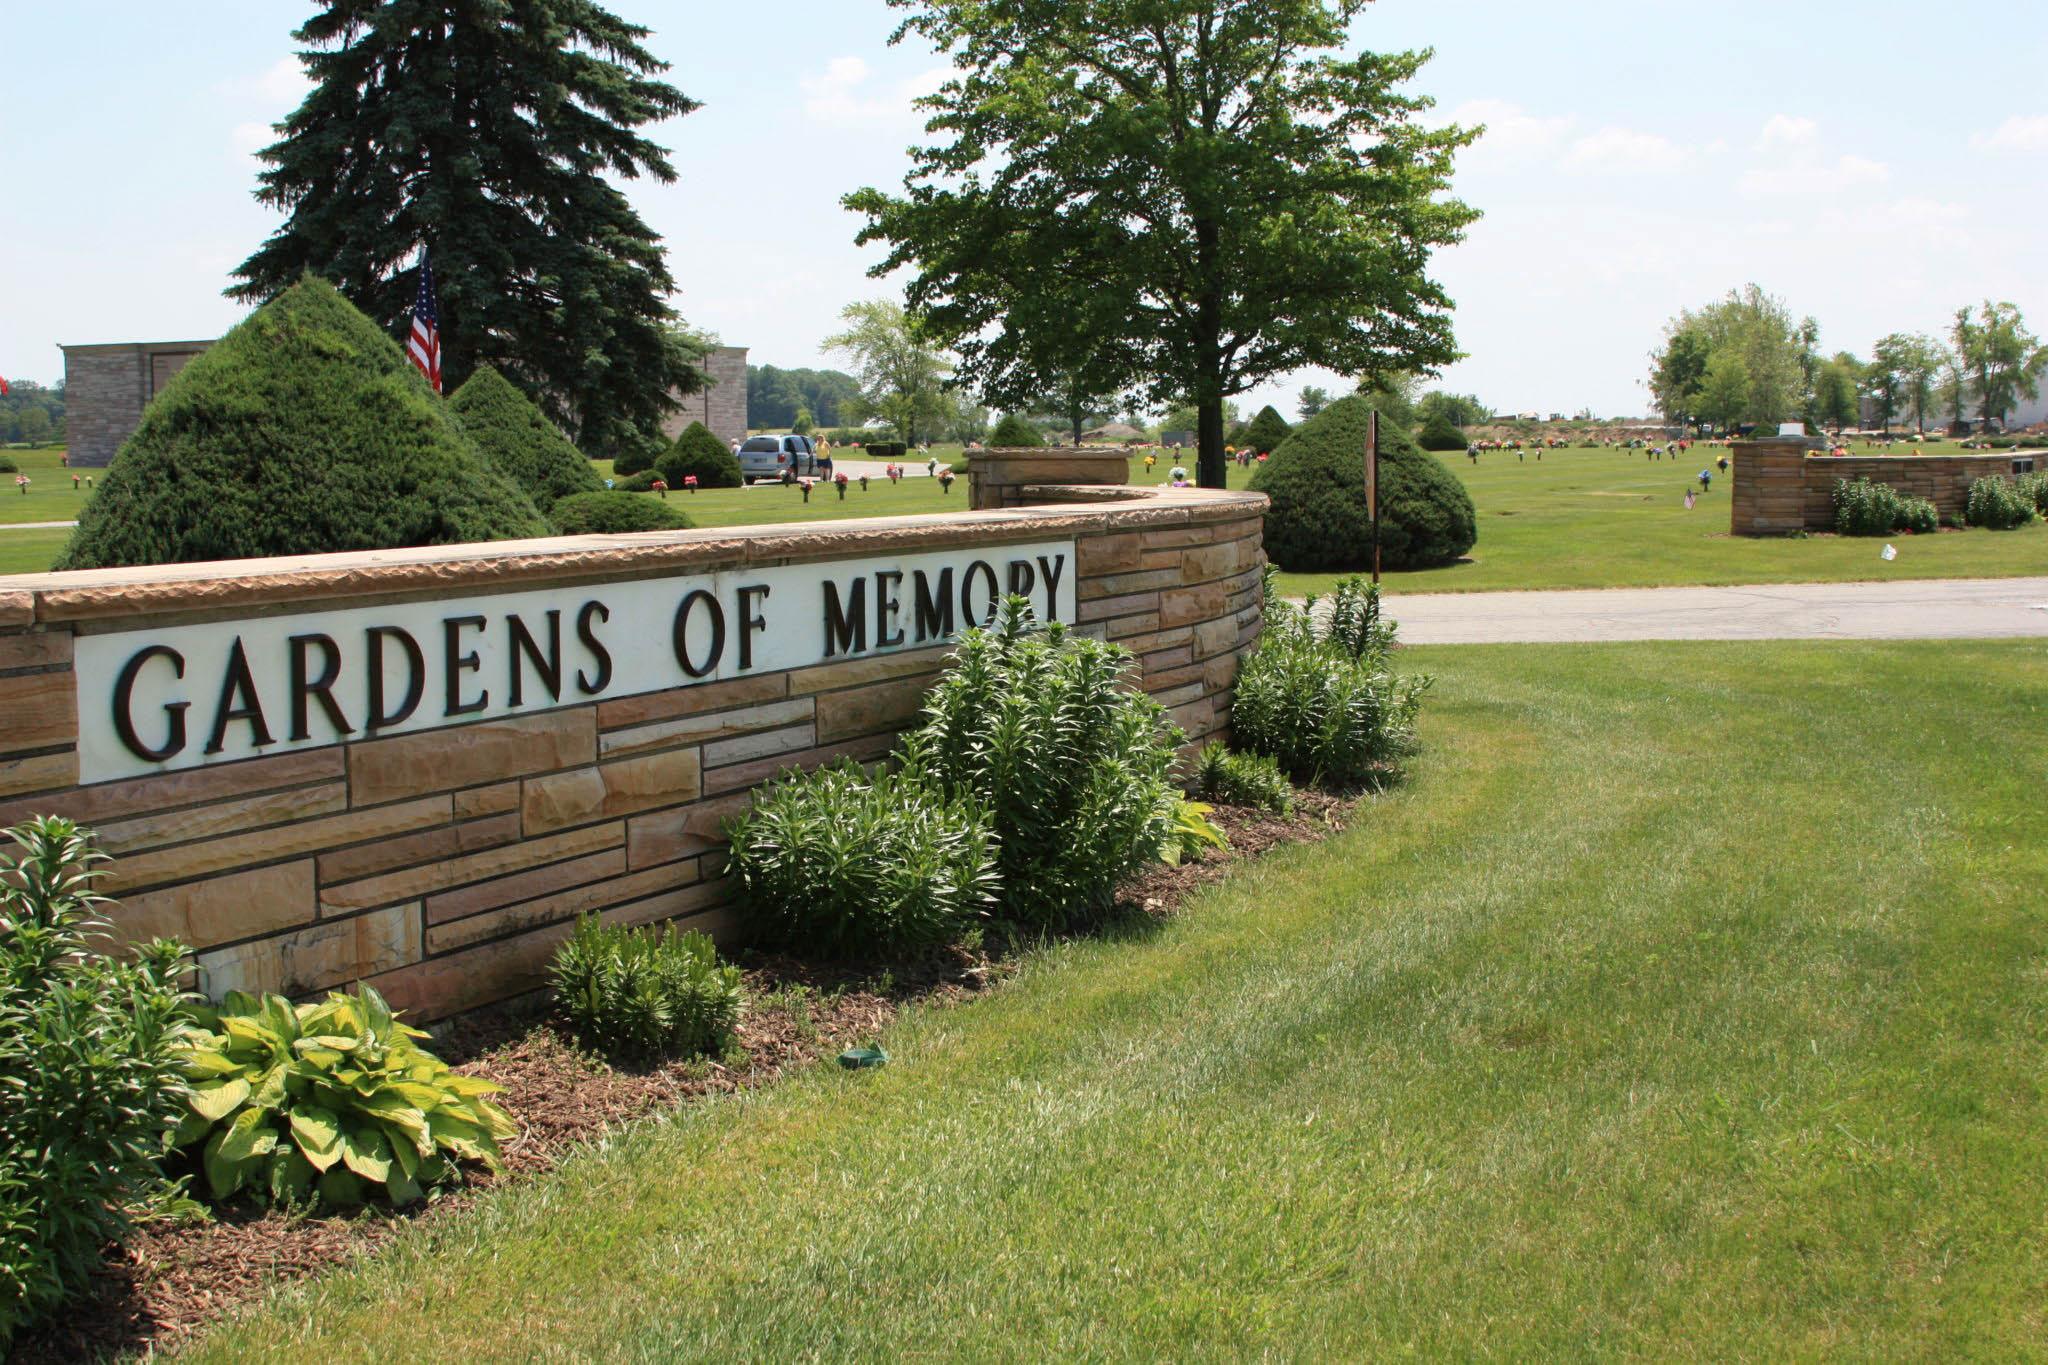 Gardens of Memory Entrance